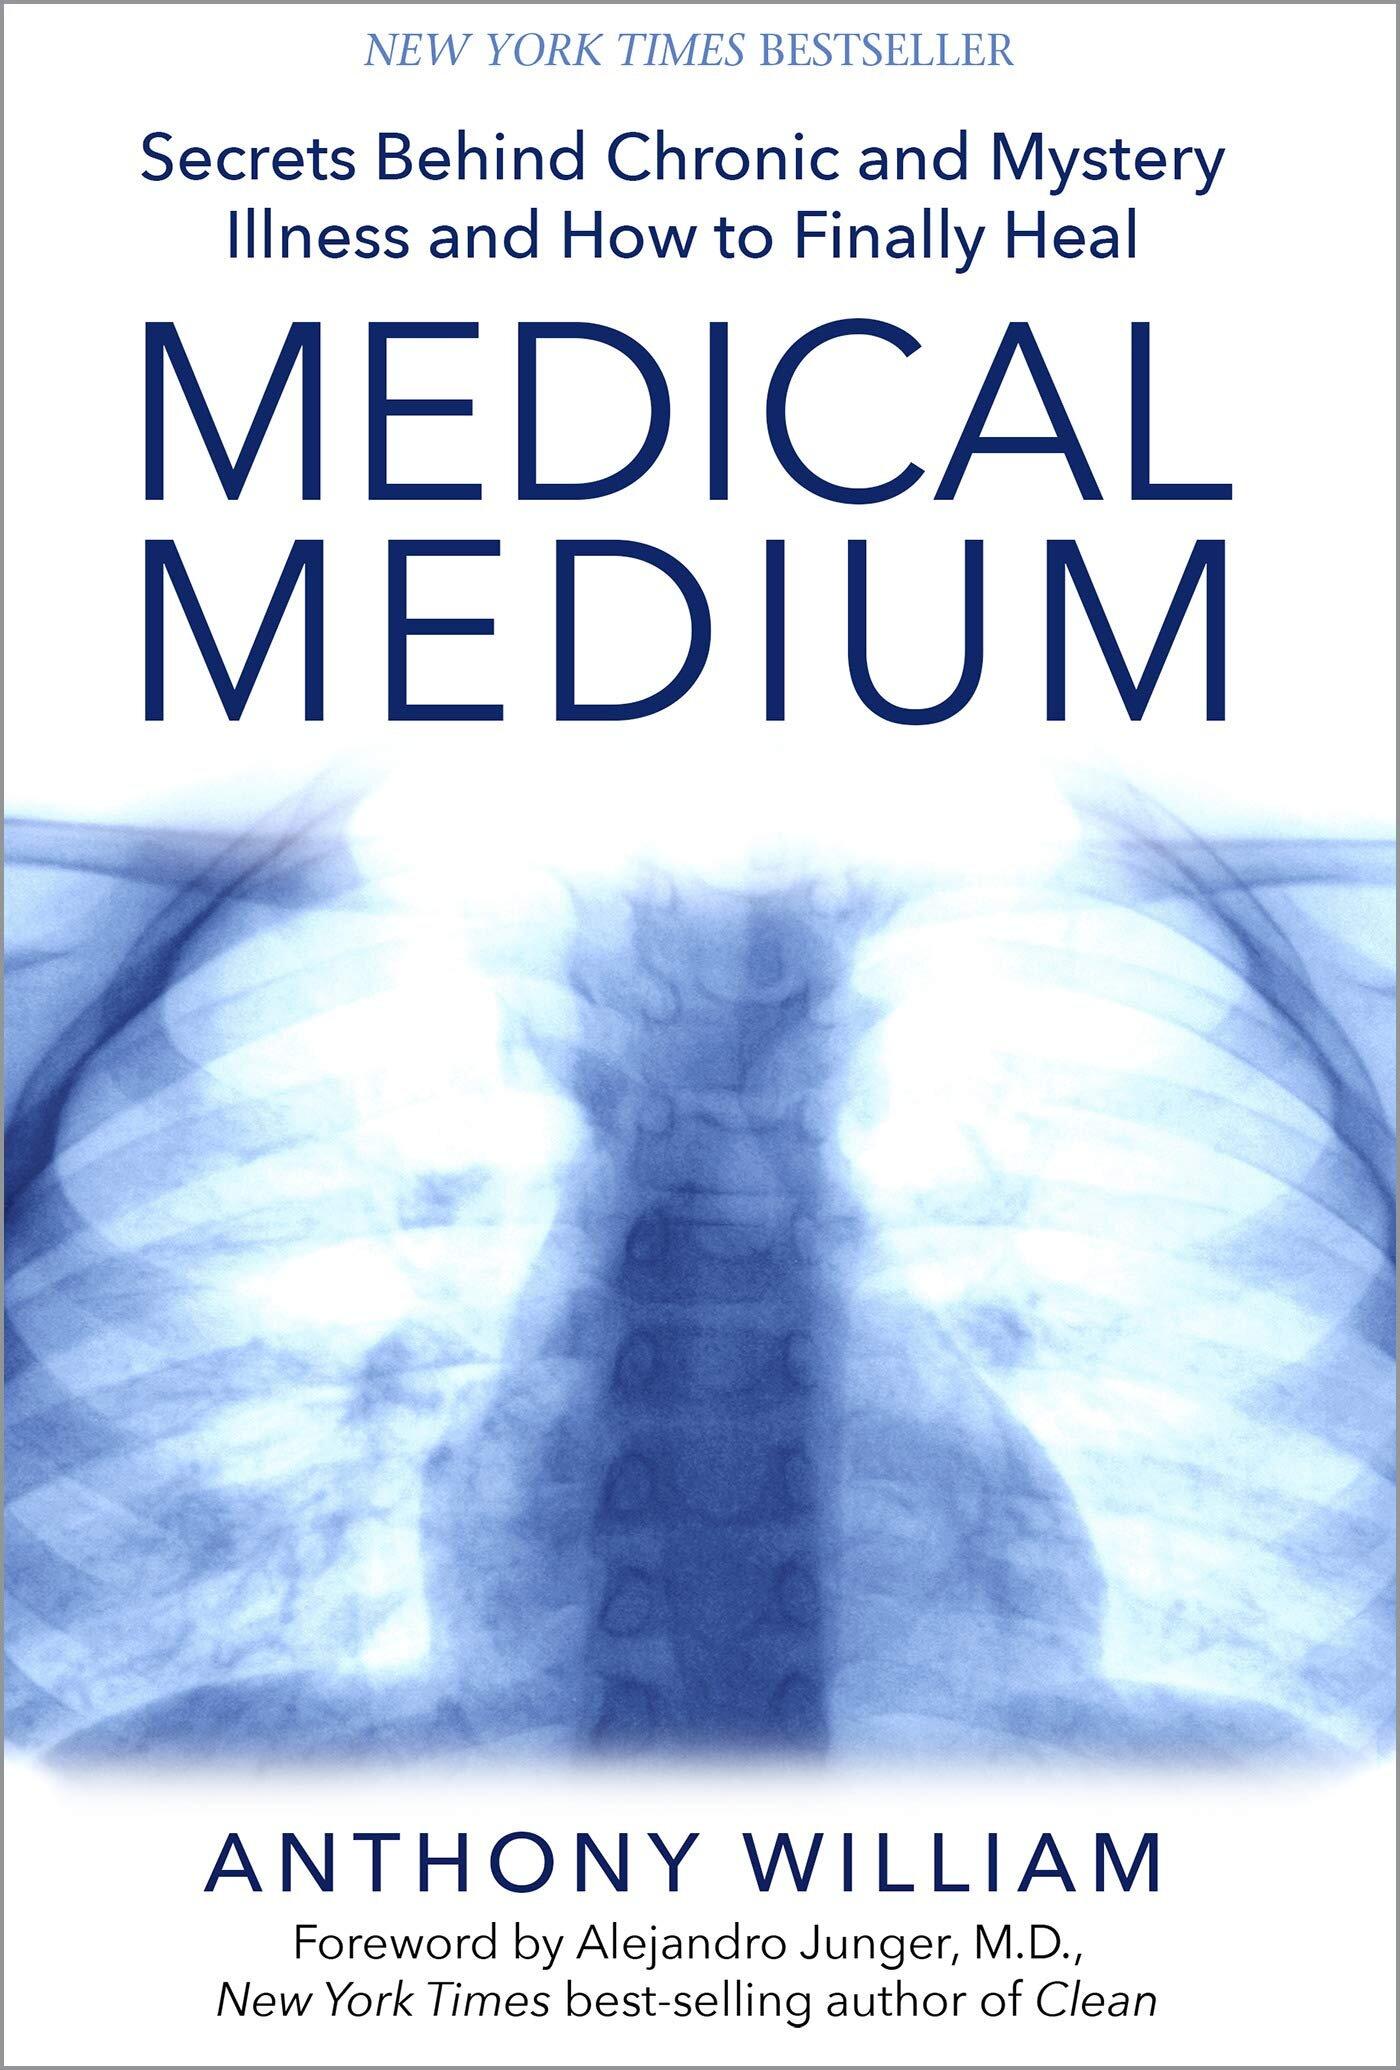 Medical Medium's first book